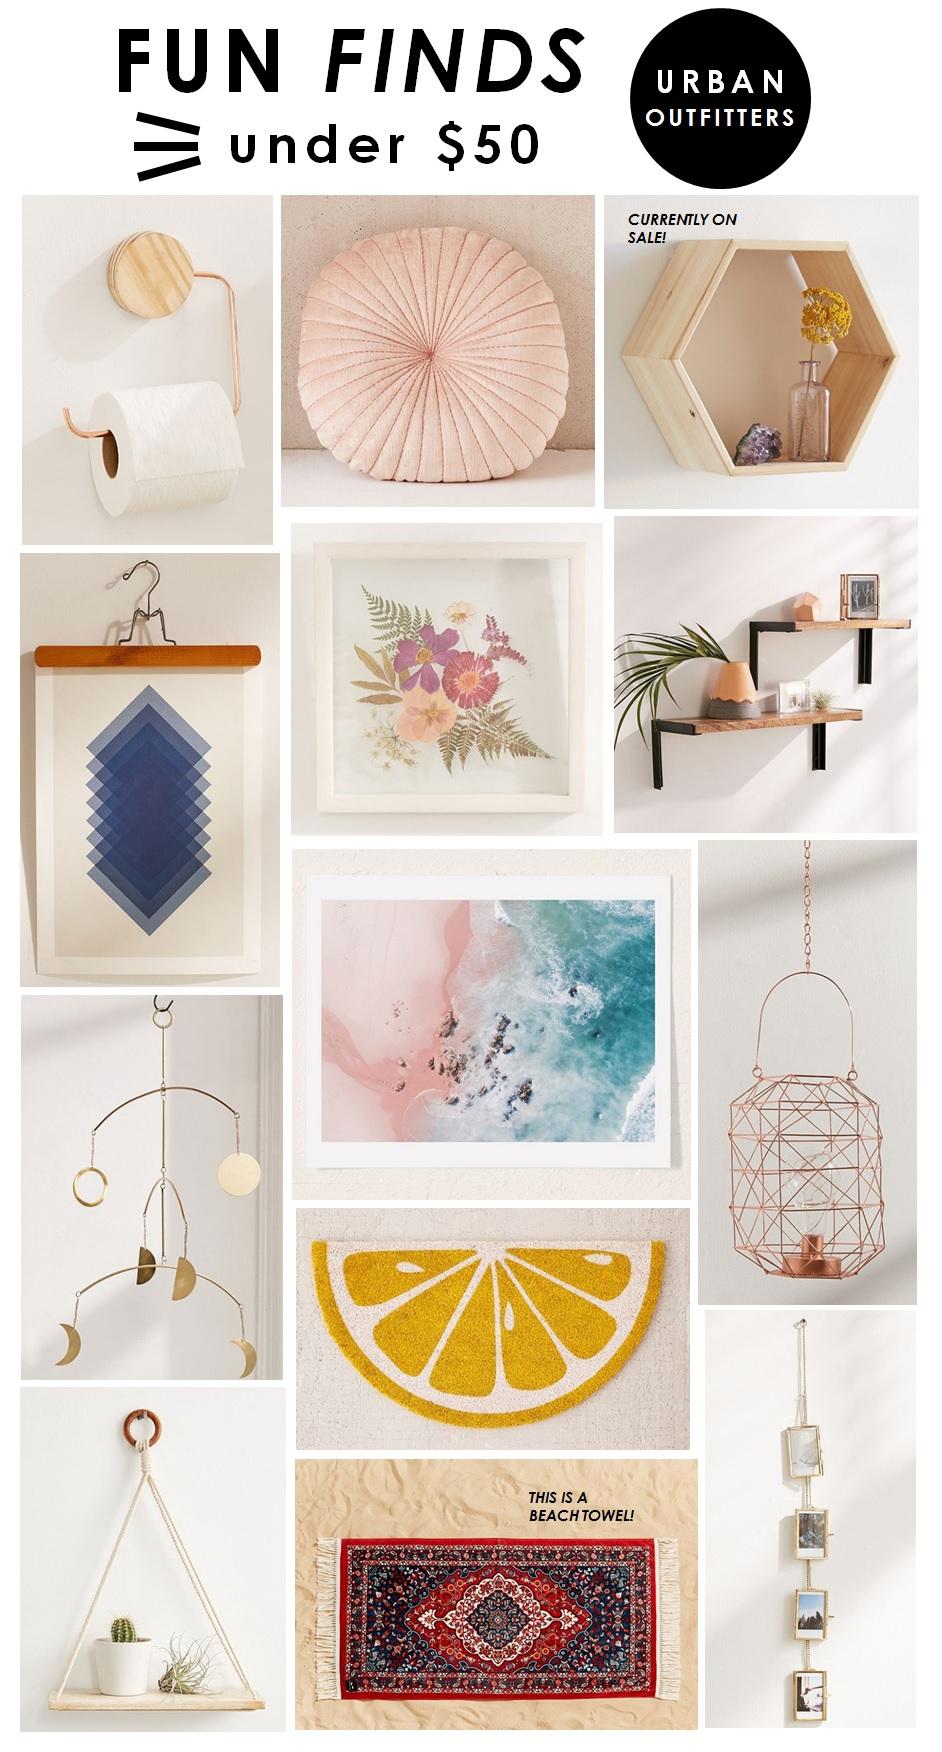 Toilet Paper Holder  |  Round Pillow  |  Hexagon Shelf  |  Picture Hanger  |  Pressed Flower  |  Wall Shelves  |  Moon Phases Mobile  |  Lemon Doormat  |  Hanging Lantern  |  Beach Print  | Rope Shelf  |  Beach Towel  |  Photo Frames Banner